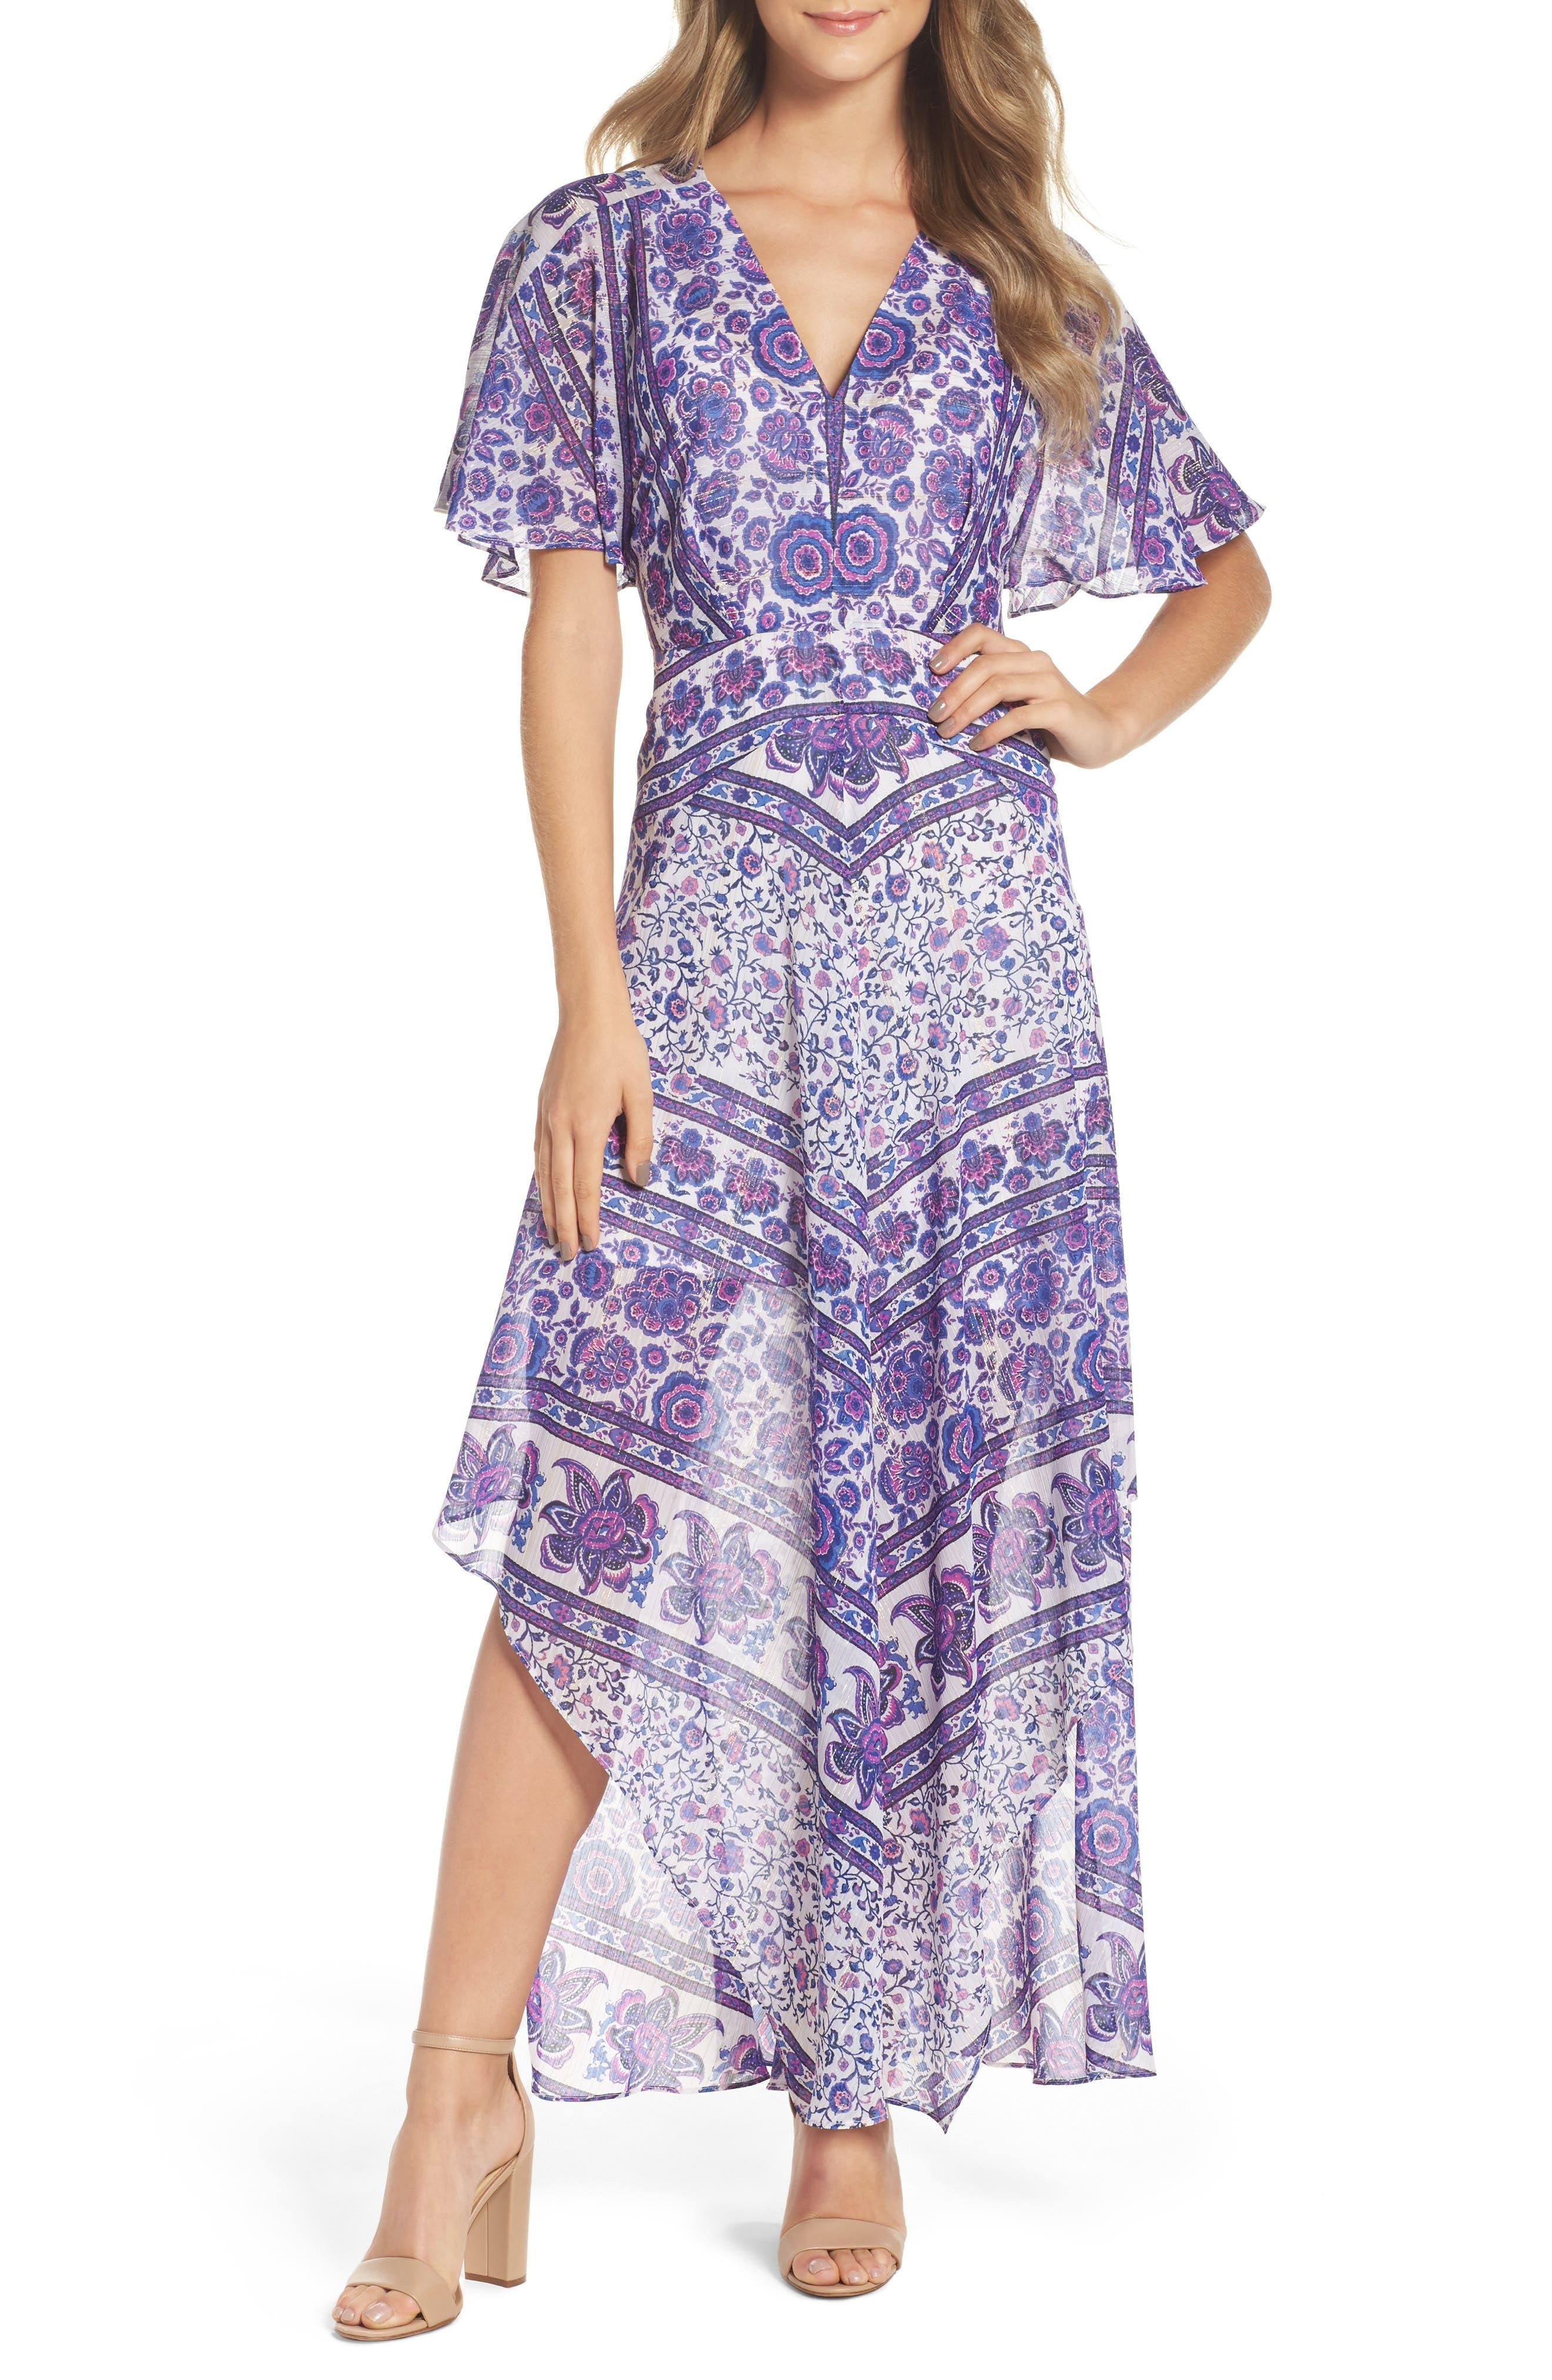 Adelyn Rae Kassandra Maxi Dress